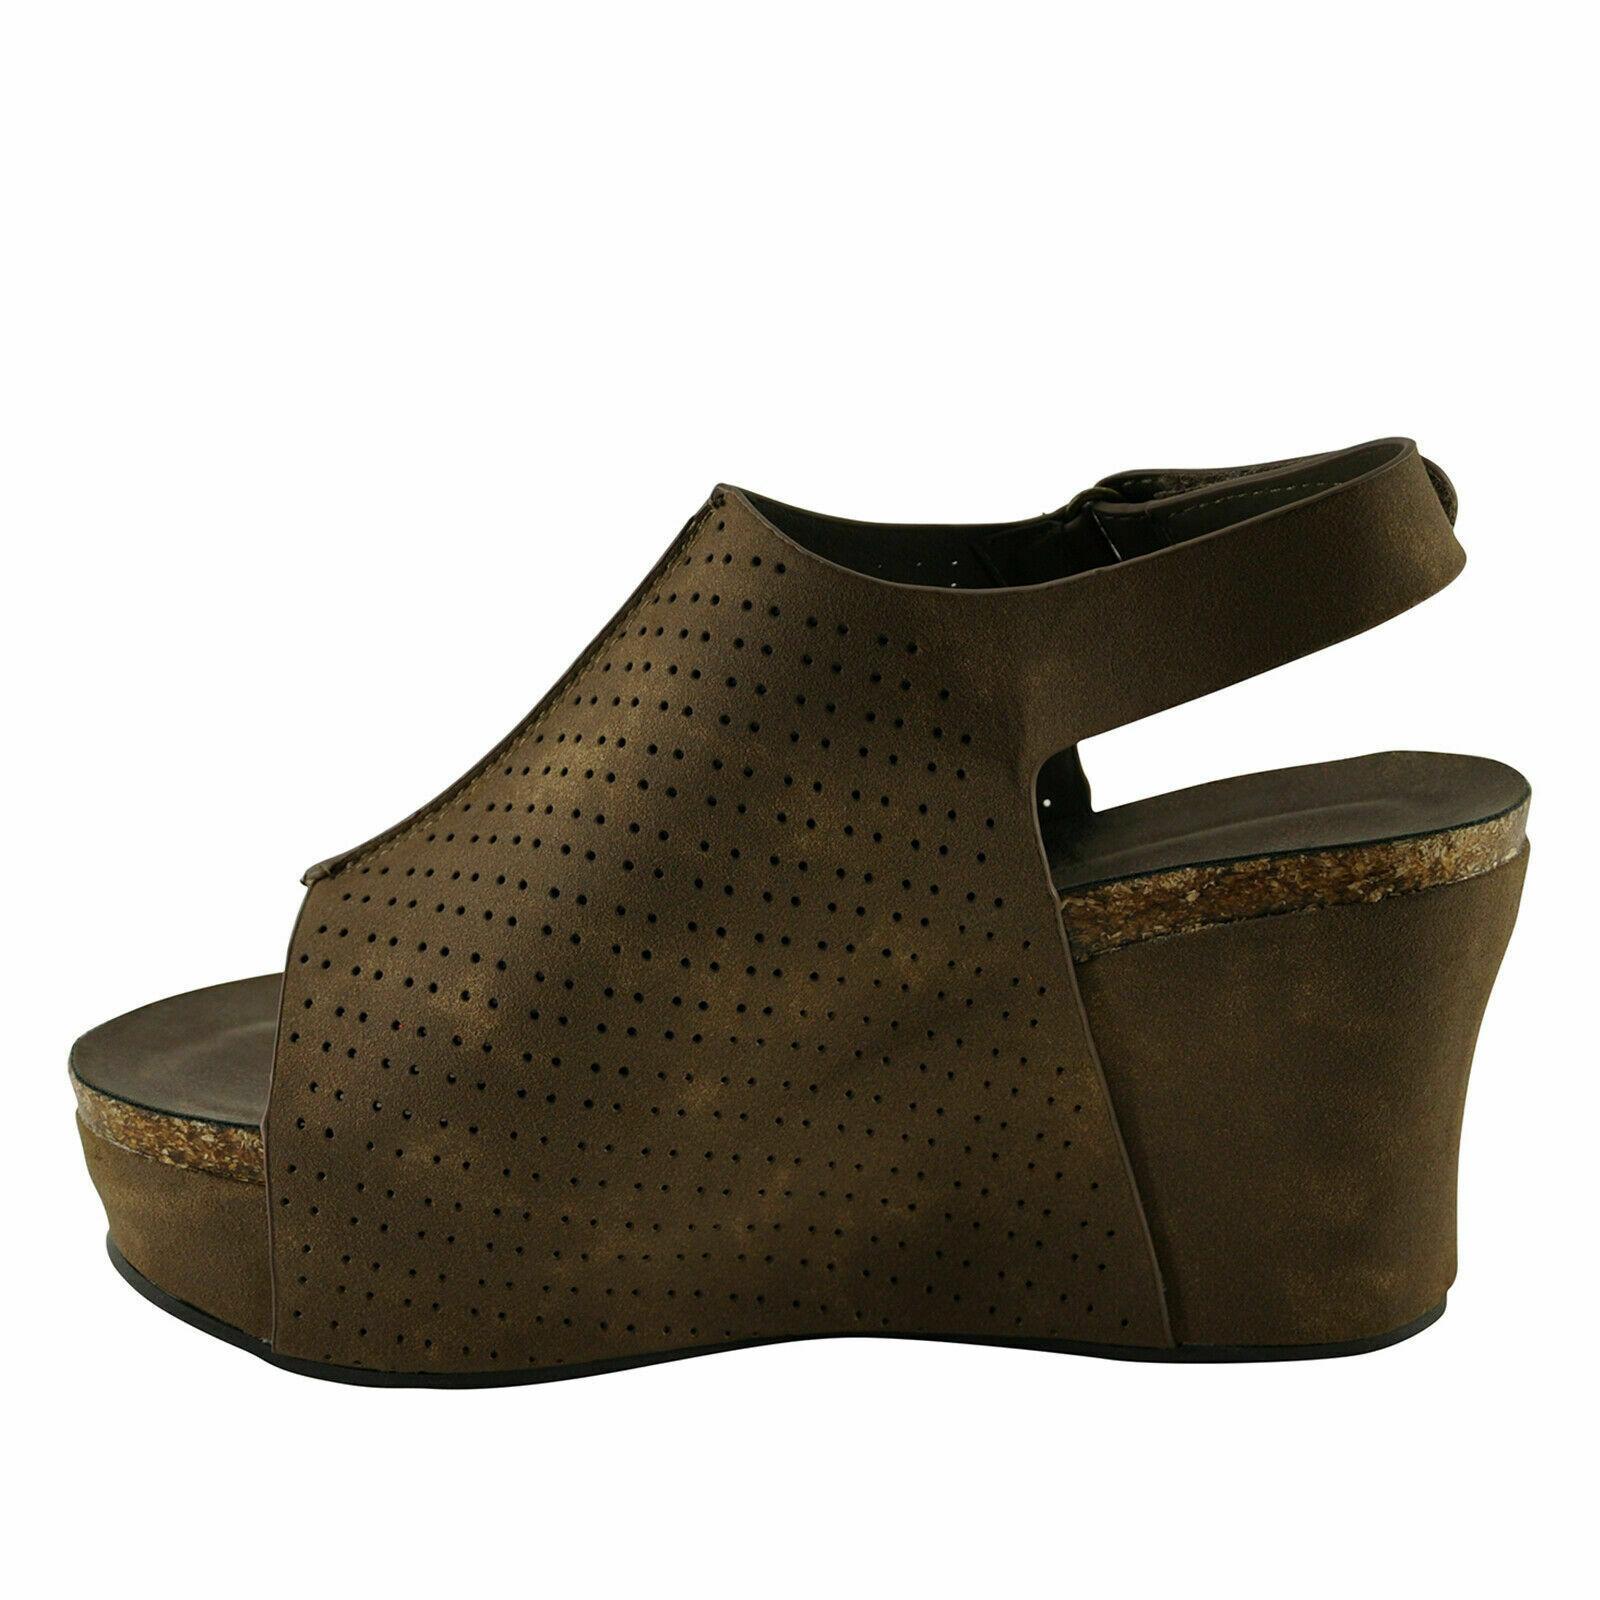 Pierre Dumas Hester-16 Taupe Women's Platform Wedge Sandals - $44.95